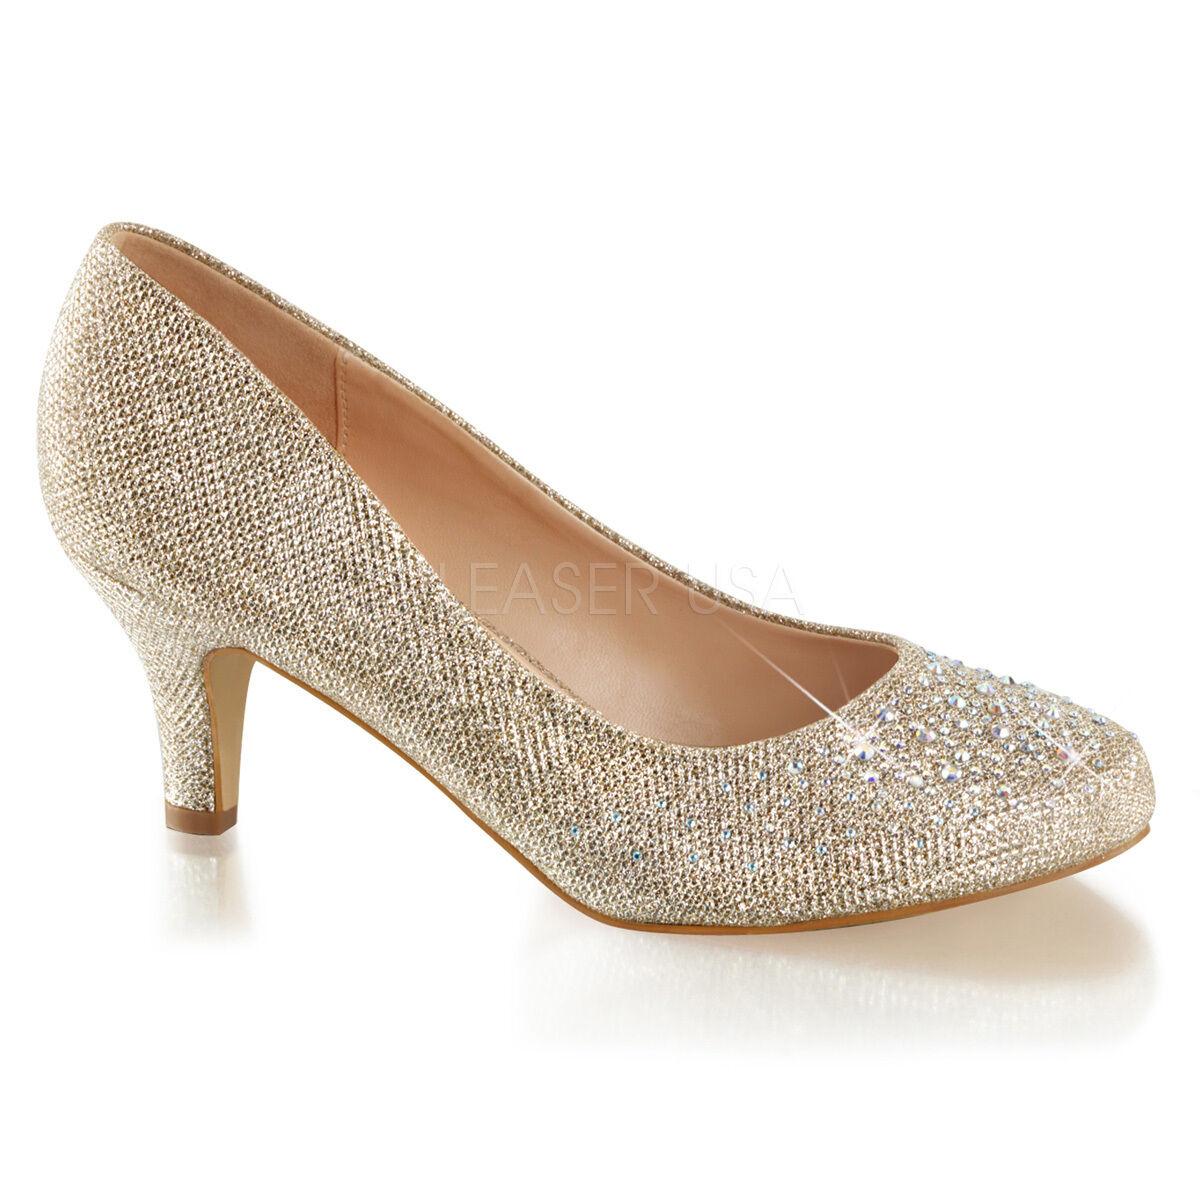 2  gold Low Heels Junior Bridesmaid Flower Girl Vintage Wedding shoes size 6 7 8